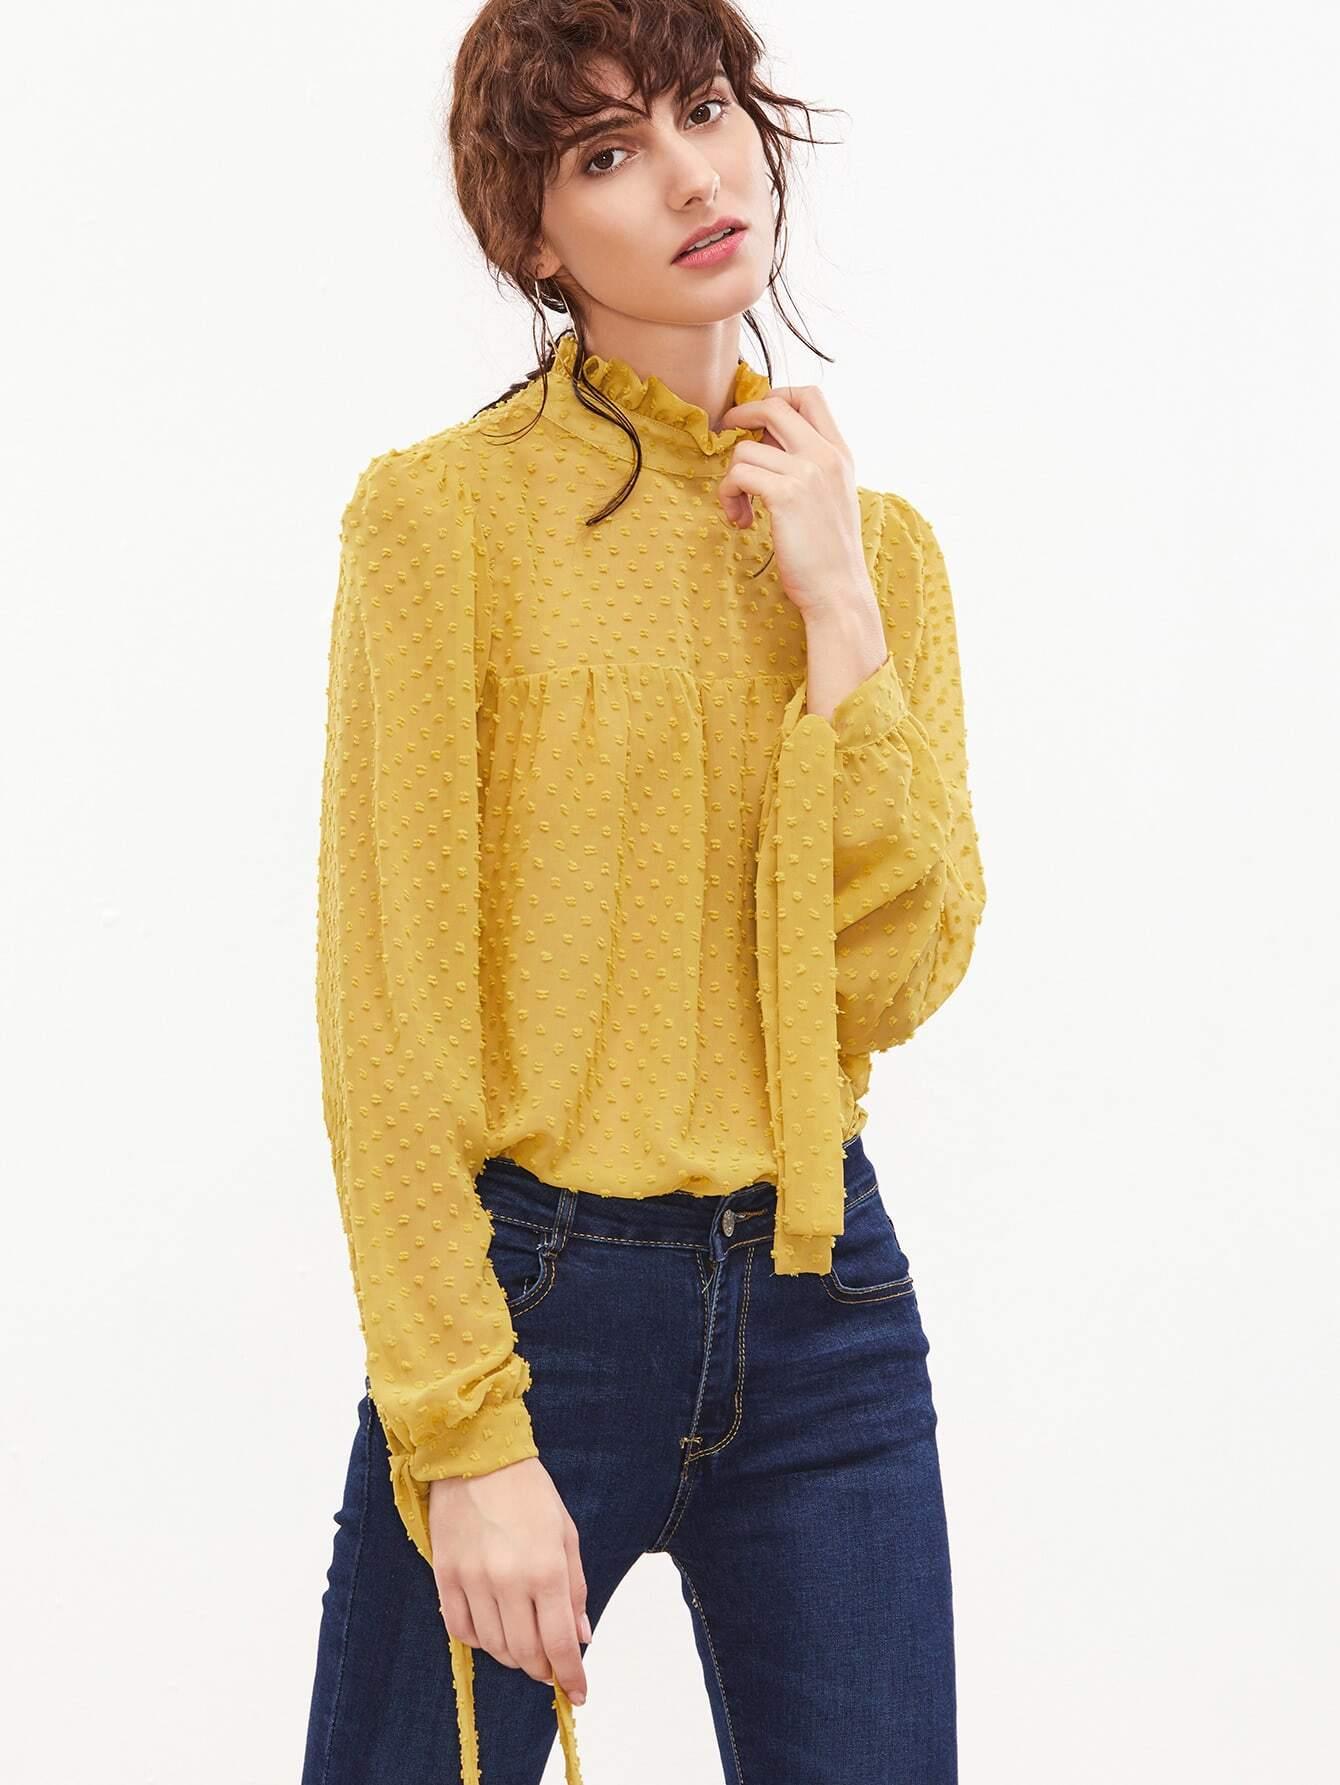 blouse161130704_2